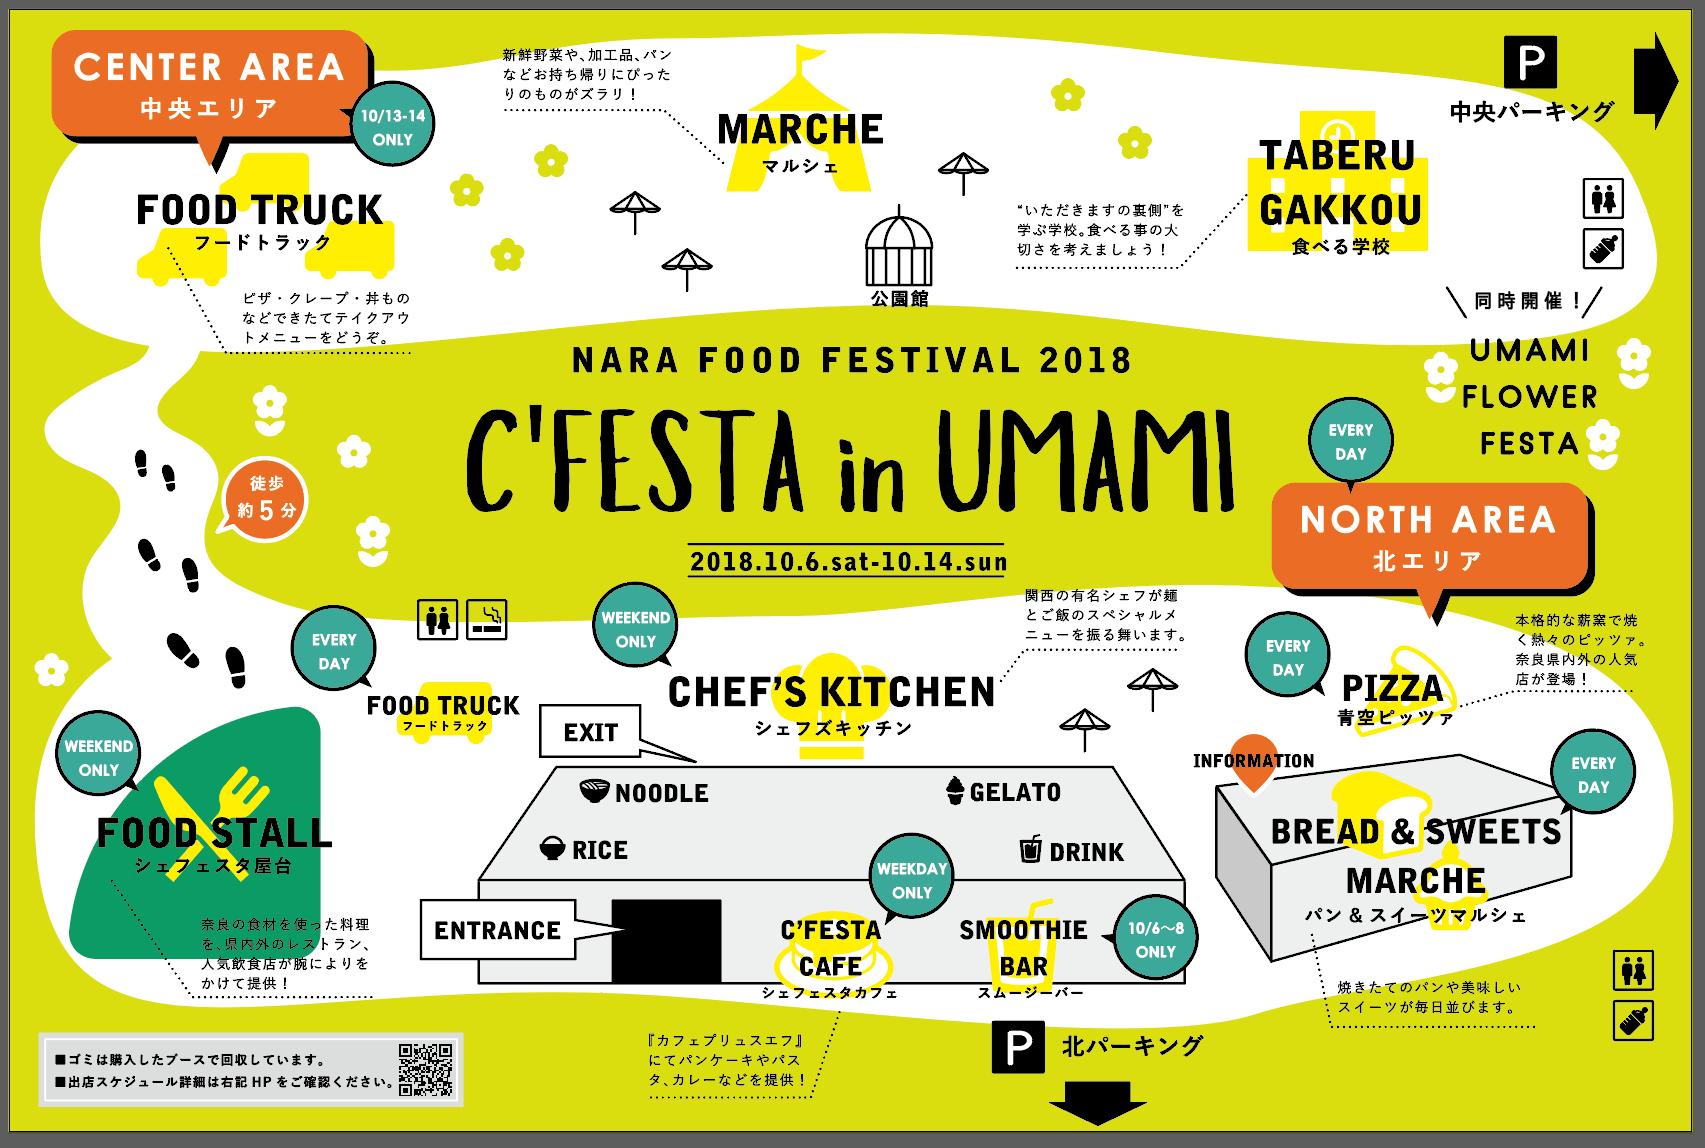 c festa in umami 馬見 出店店舗一覧 奈良のフードフェスティバル